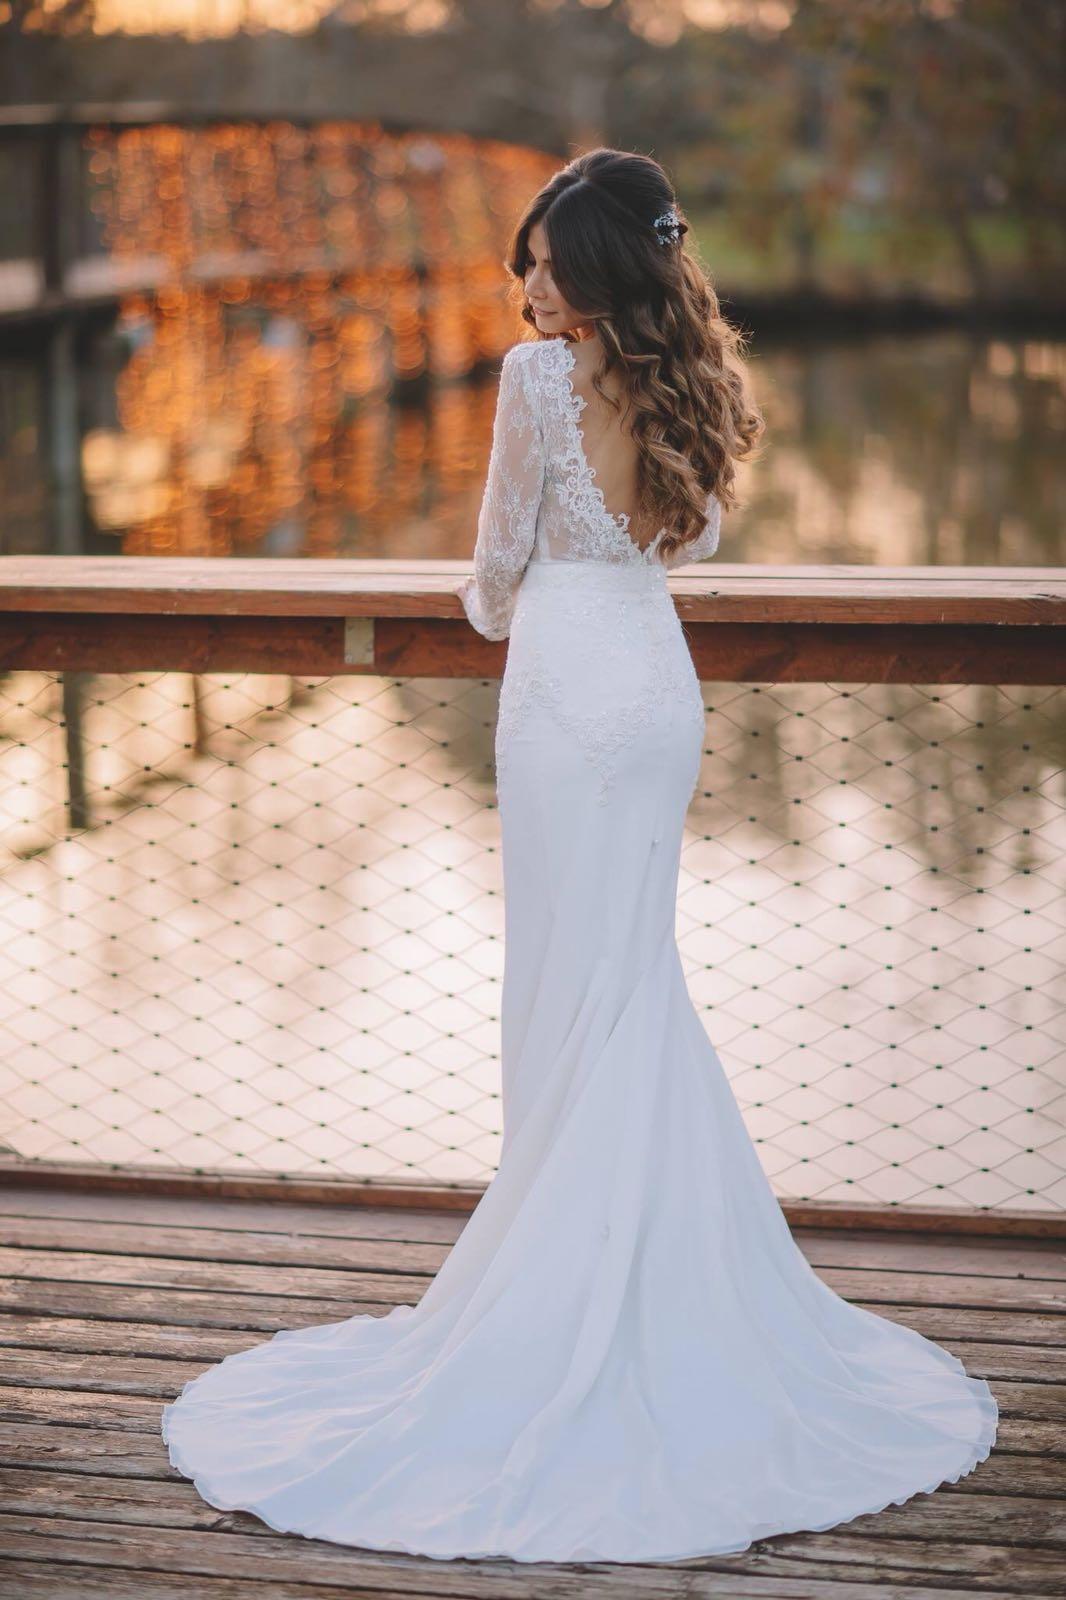 alessia-solidani-blog-salon-matrimonio-tel-aviv